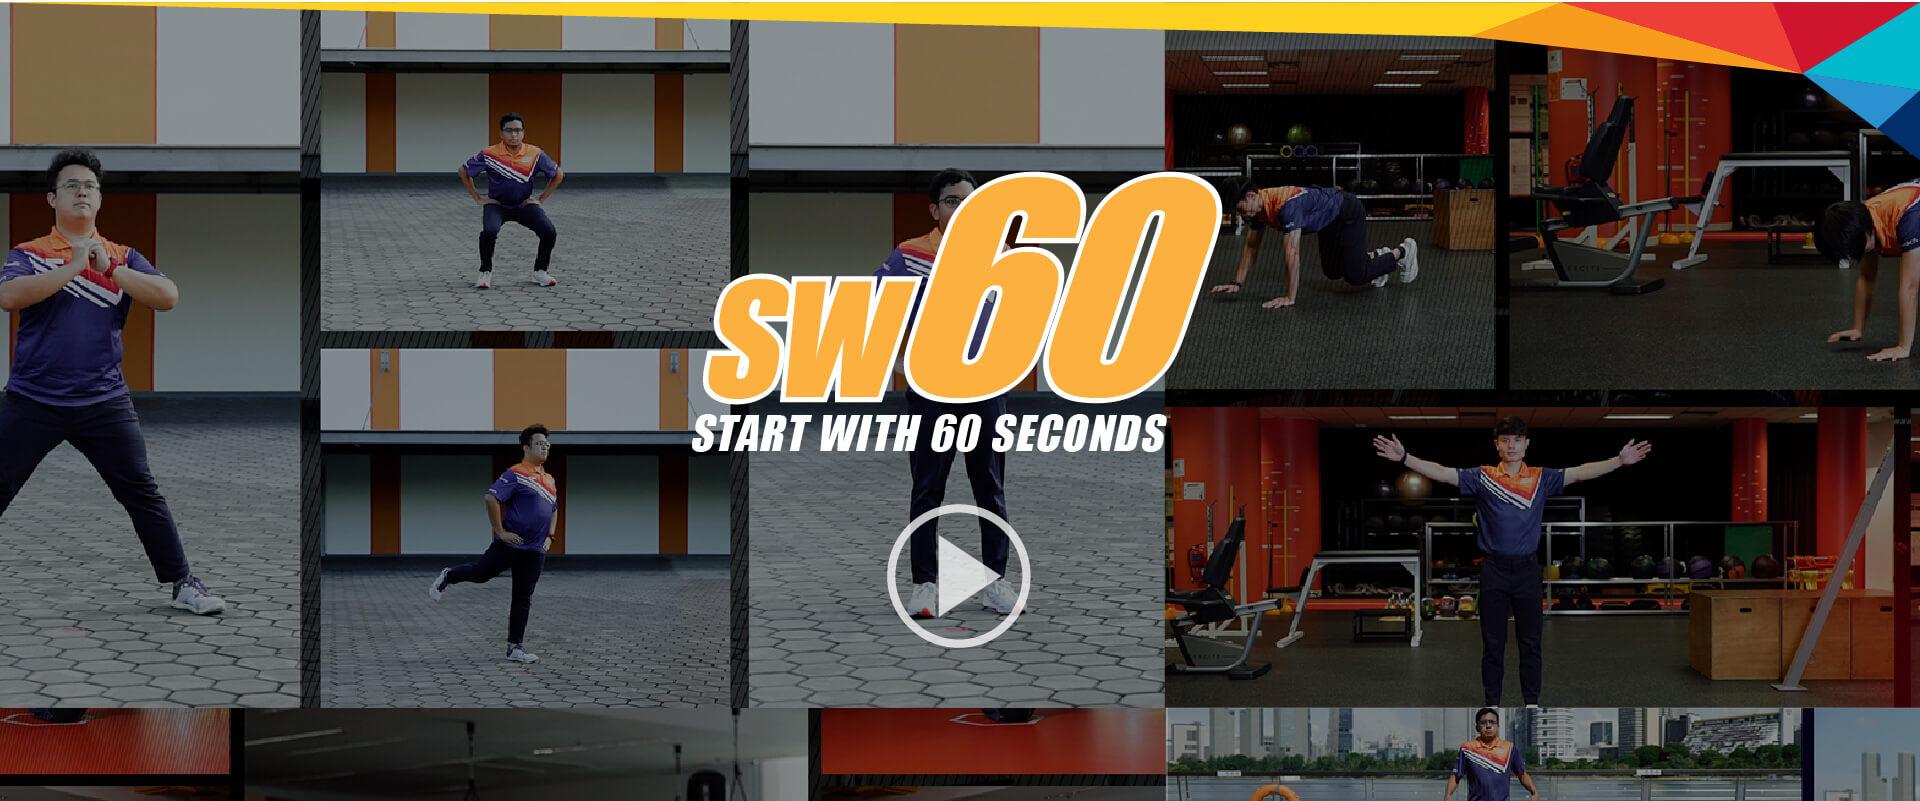 SW60_R1 (1)